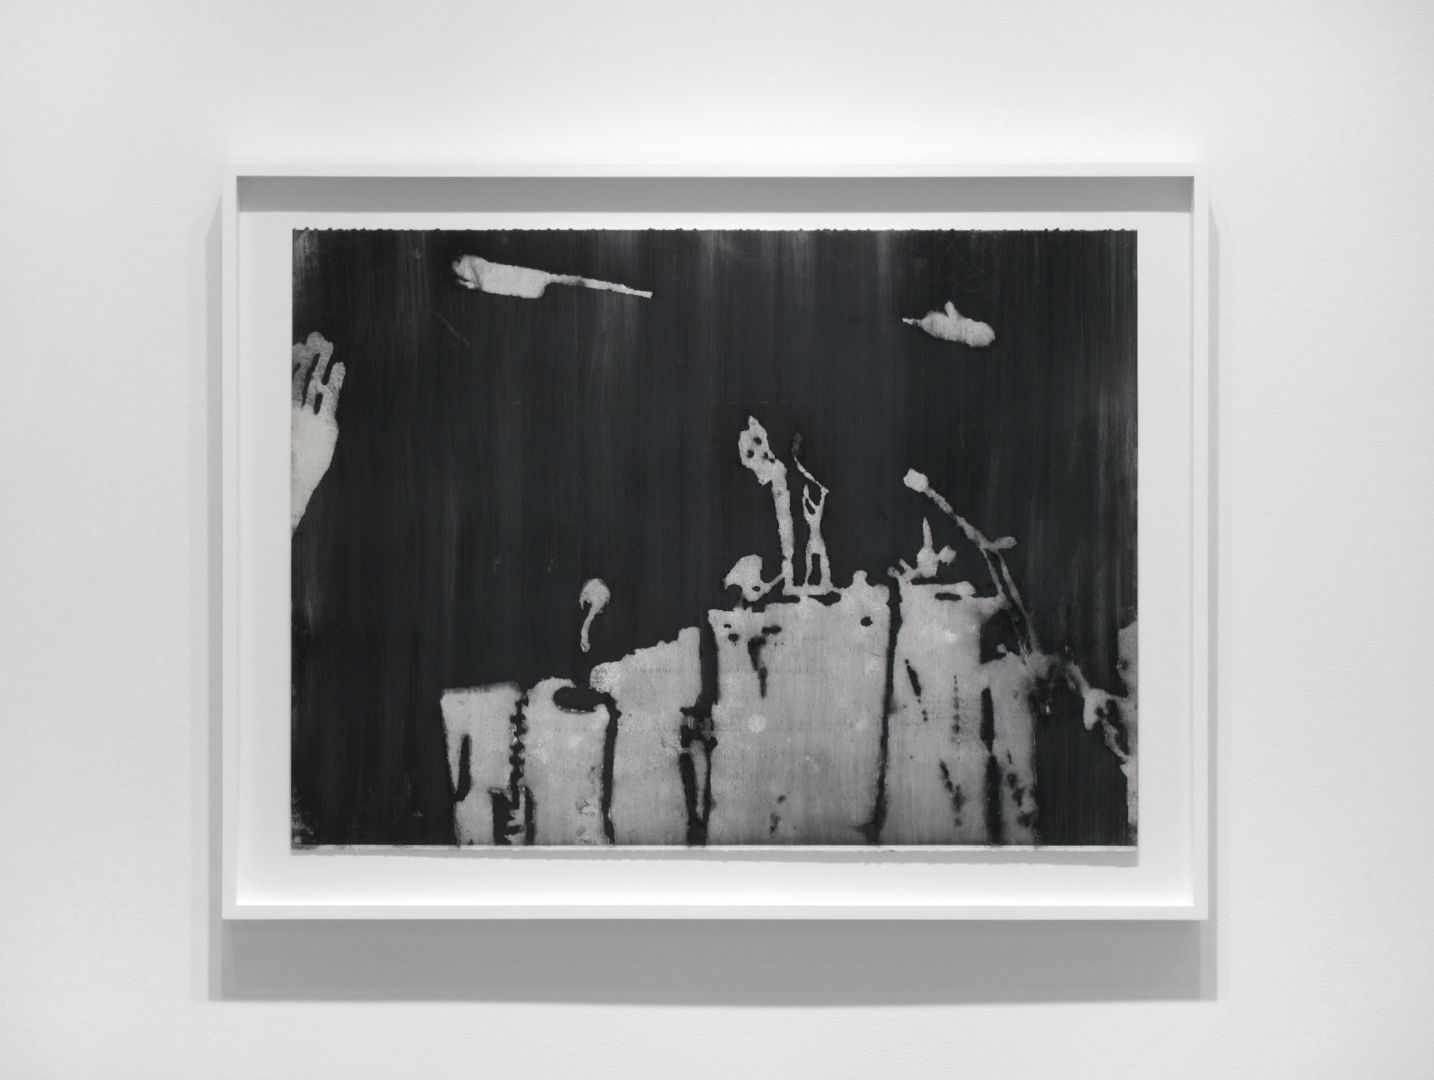 Jamal Cyrus for BMW Art Journey 12